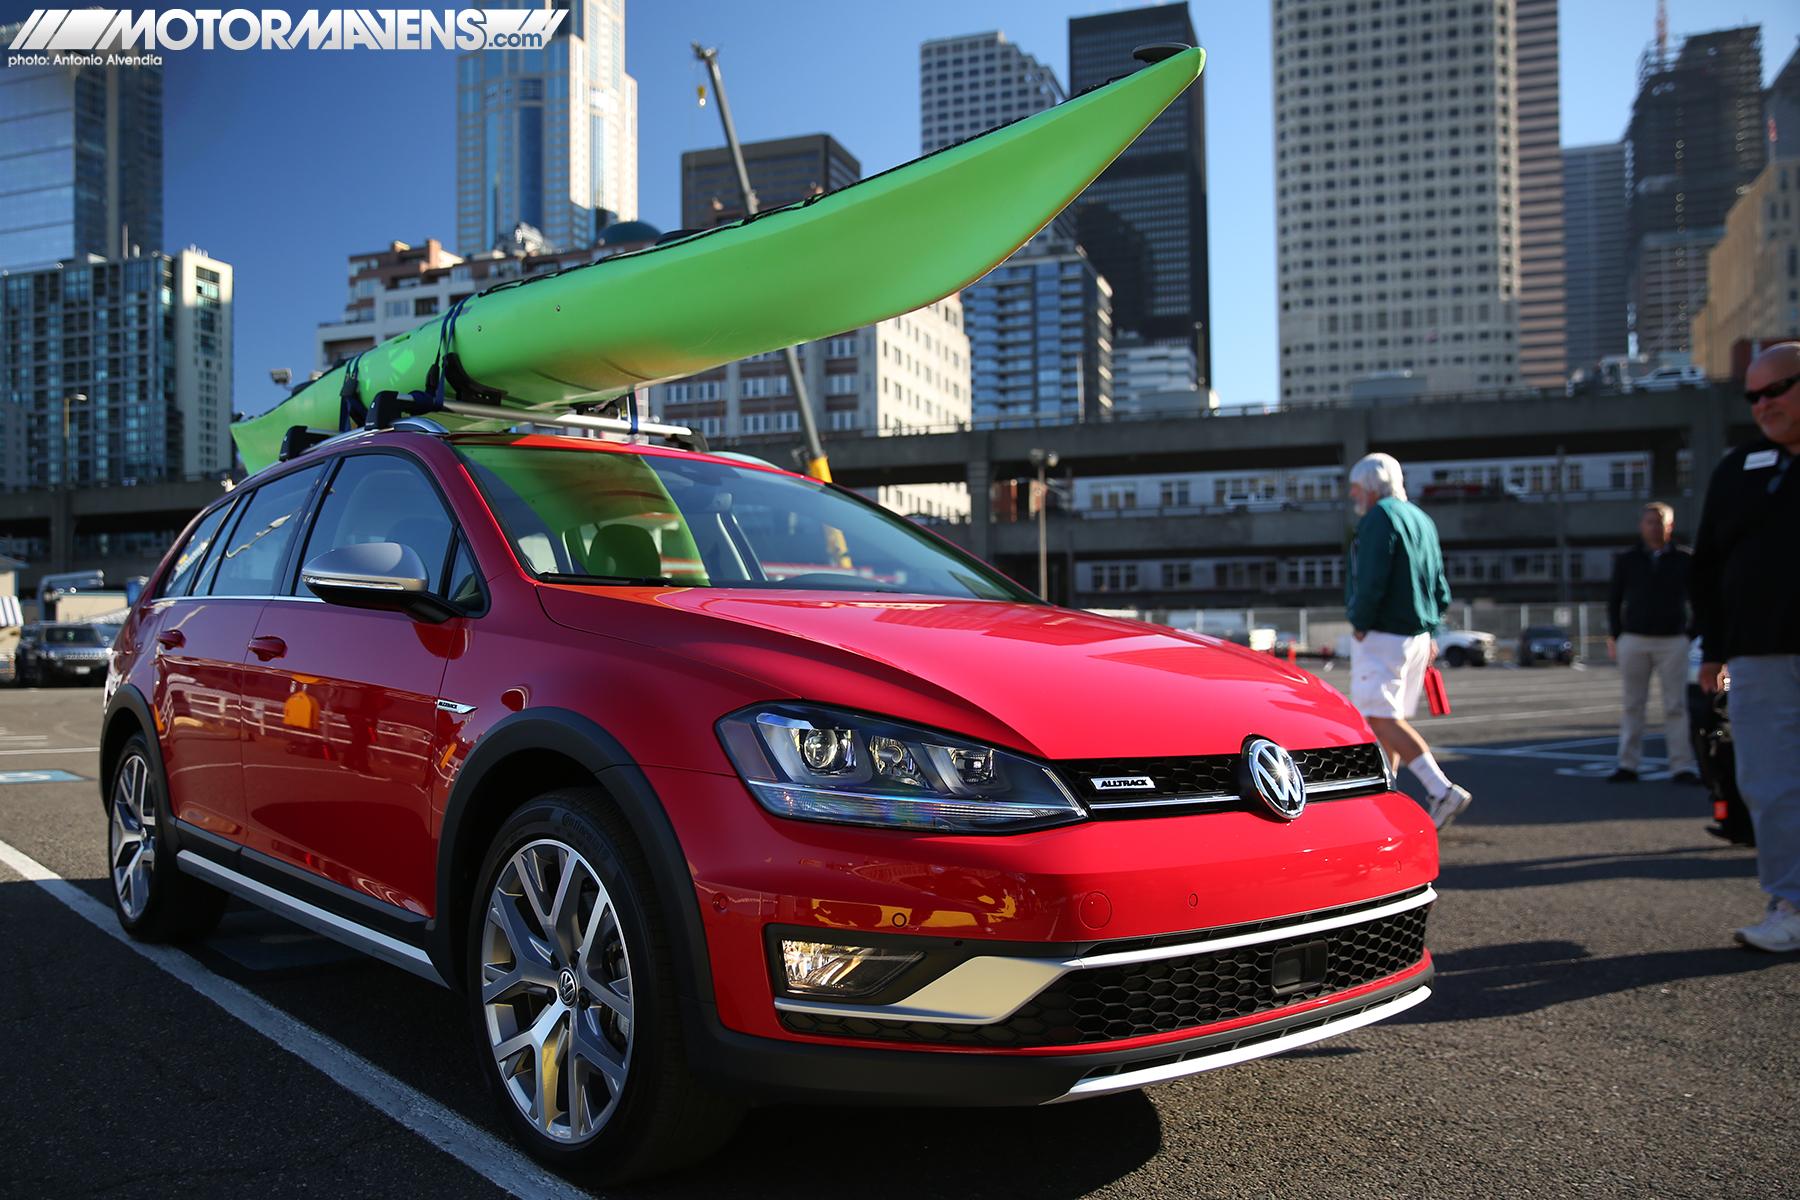 VW Golf. Golf Alltrack, Volkswagen, Sportwagen, VW